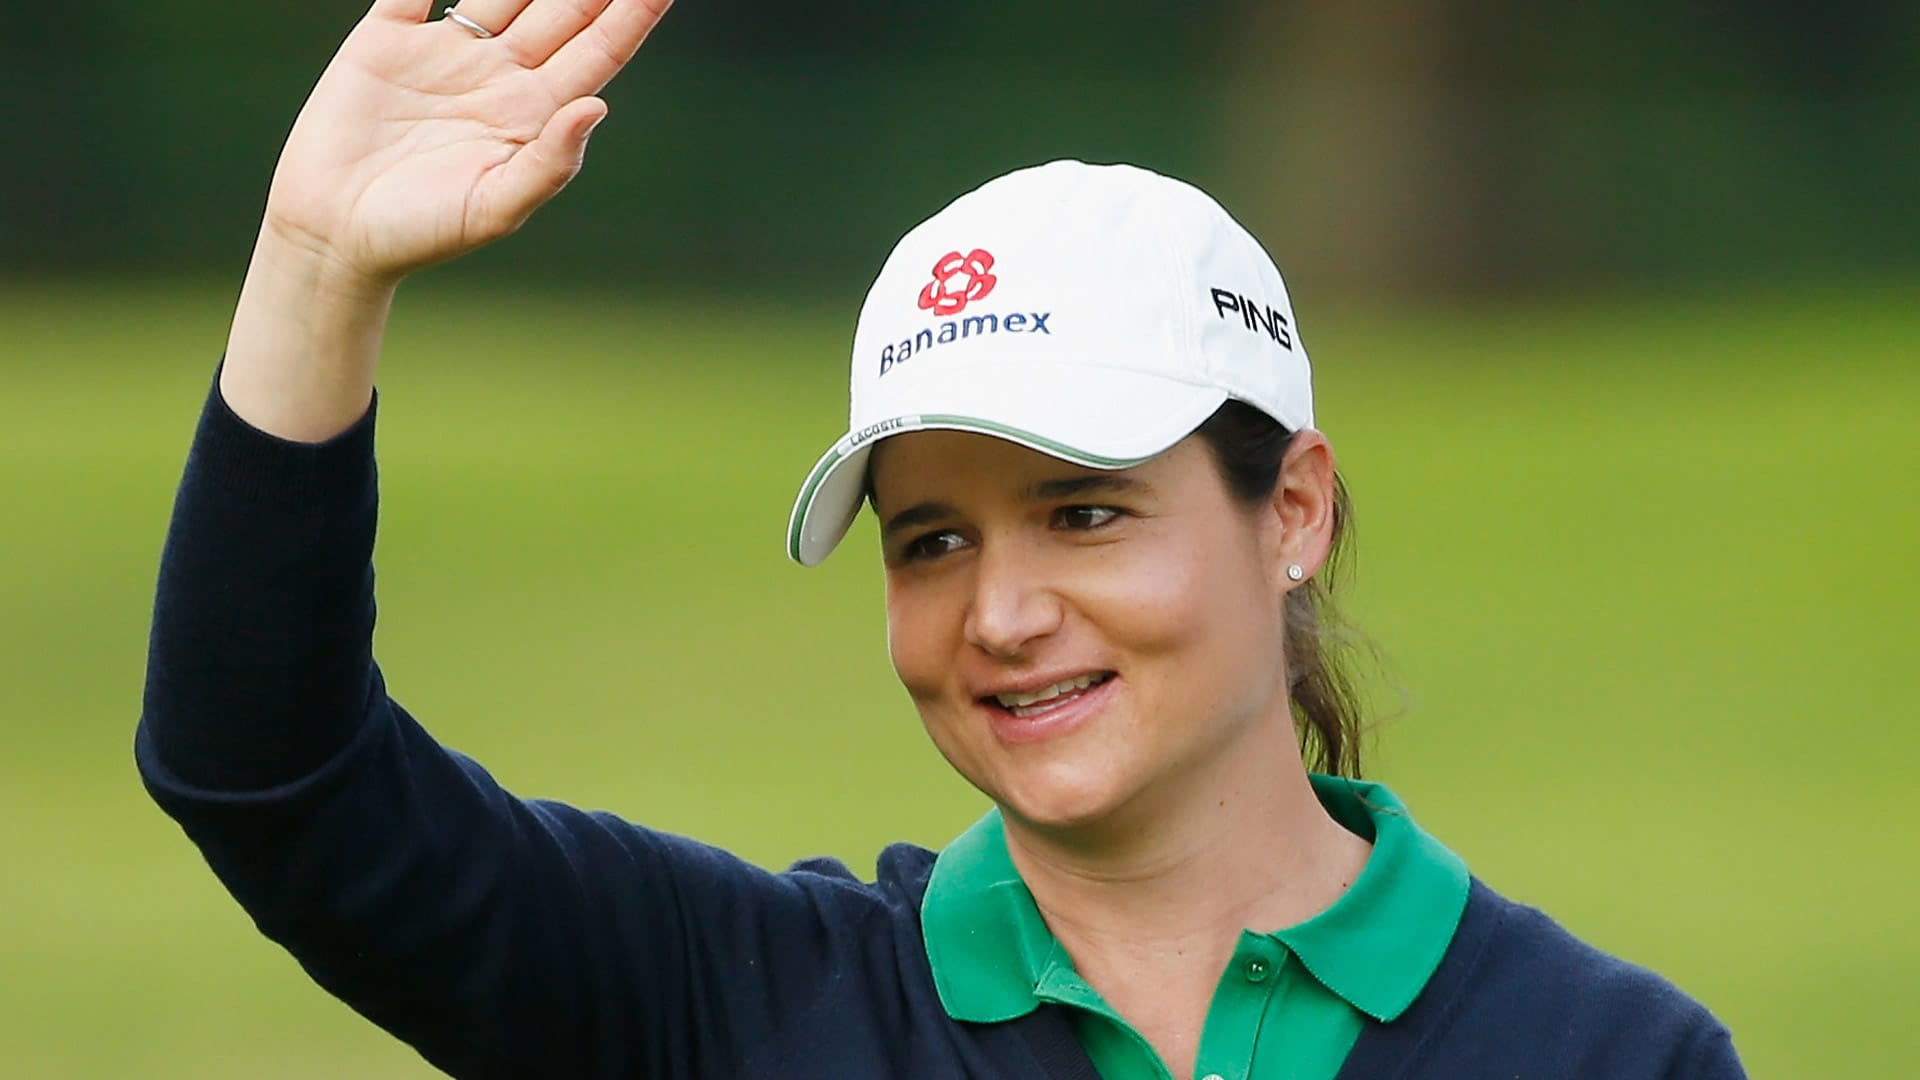 Lorena Ochoa, worlds No. 1-ranked womens golfer, retires